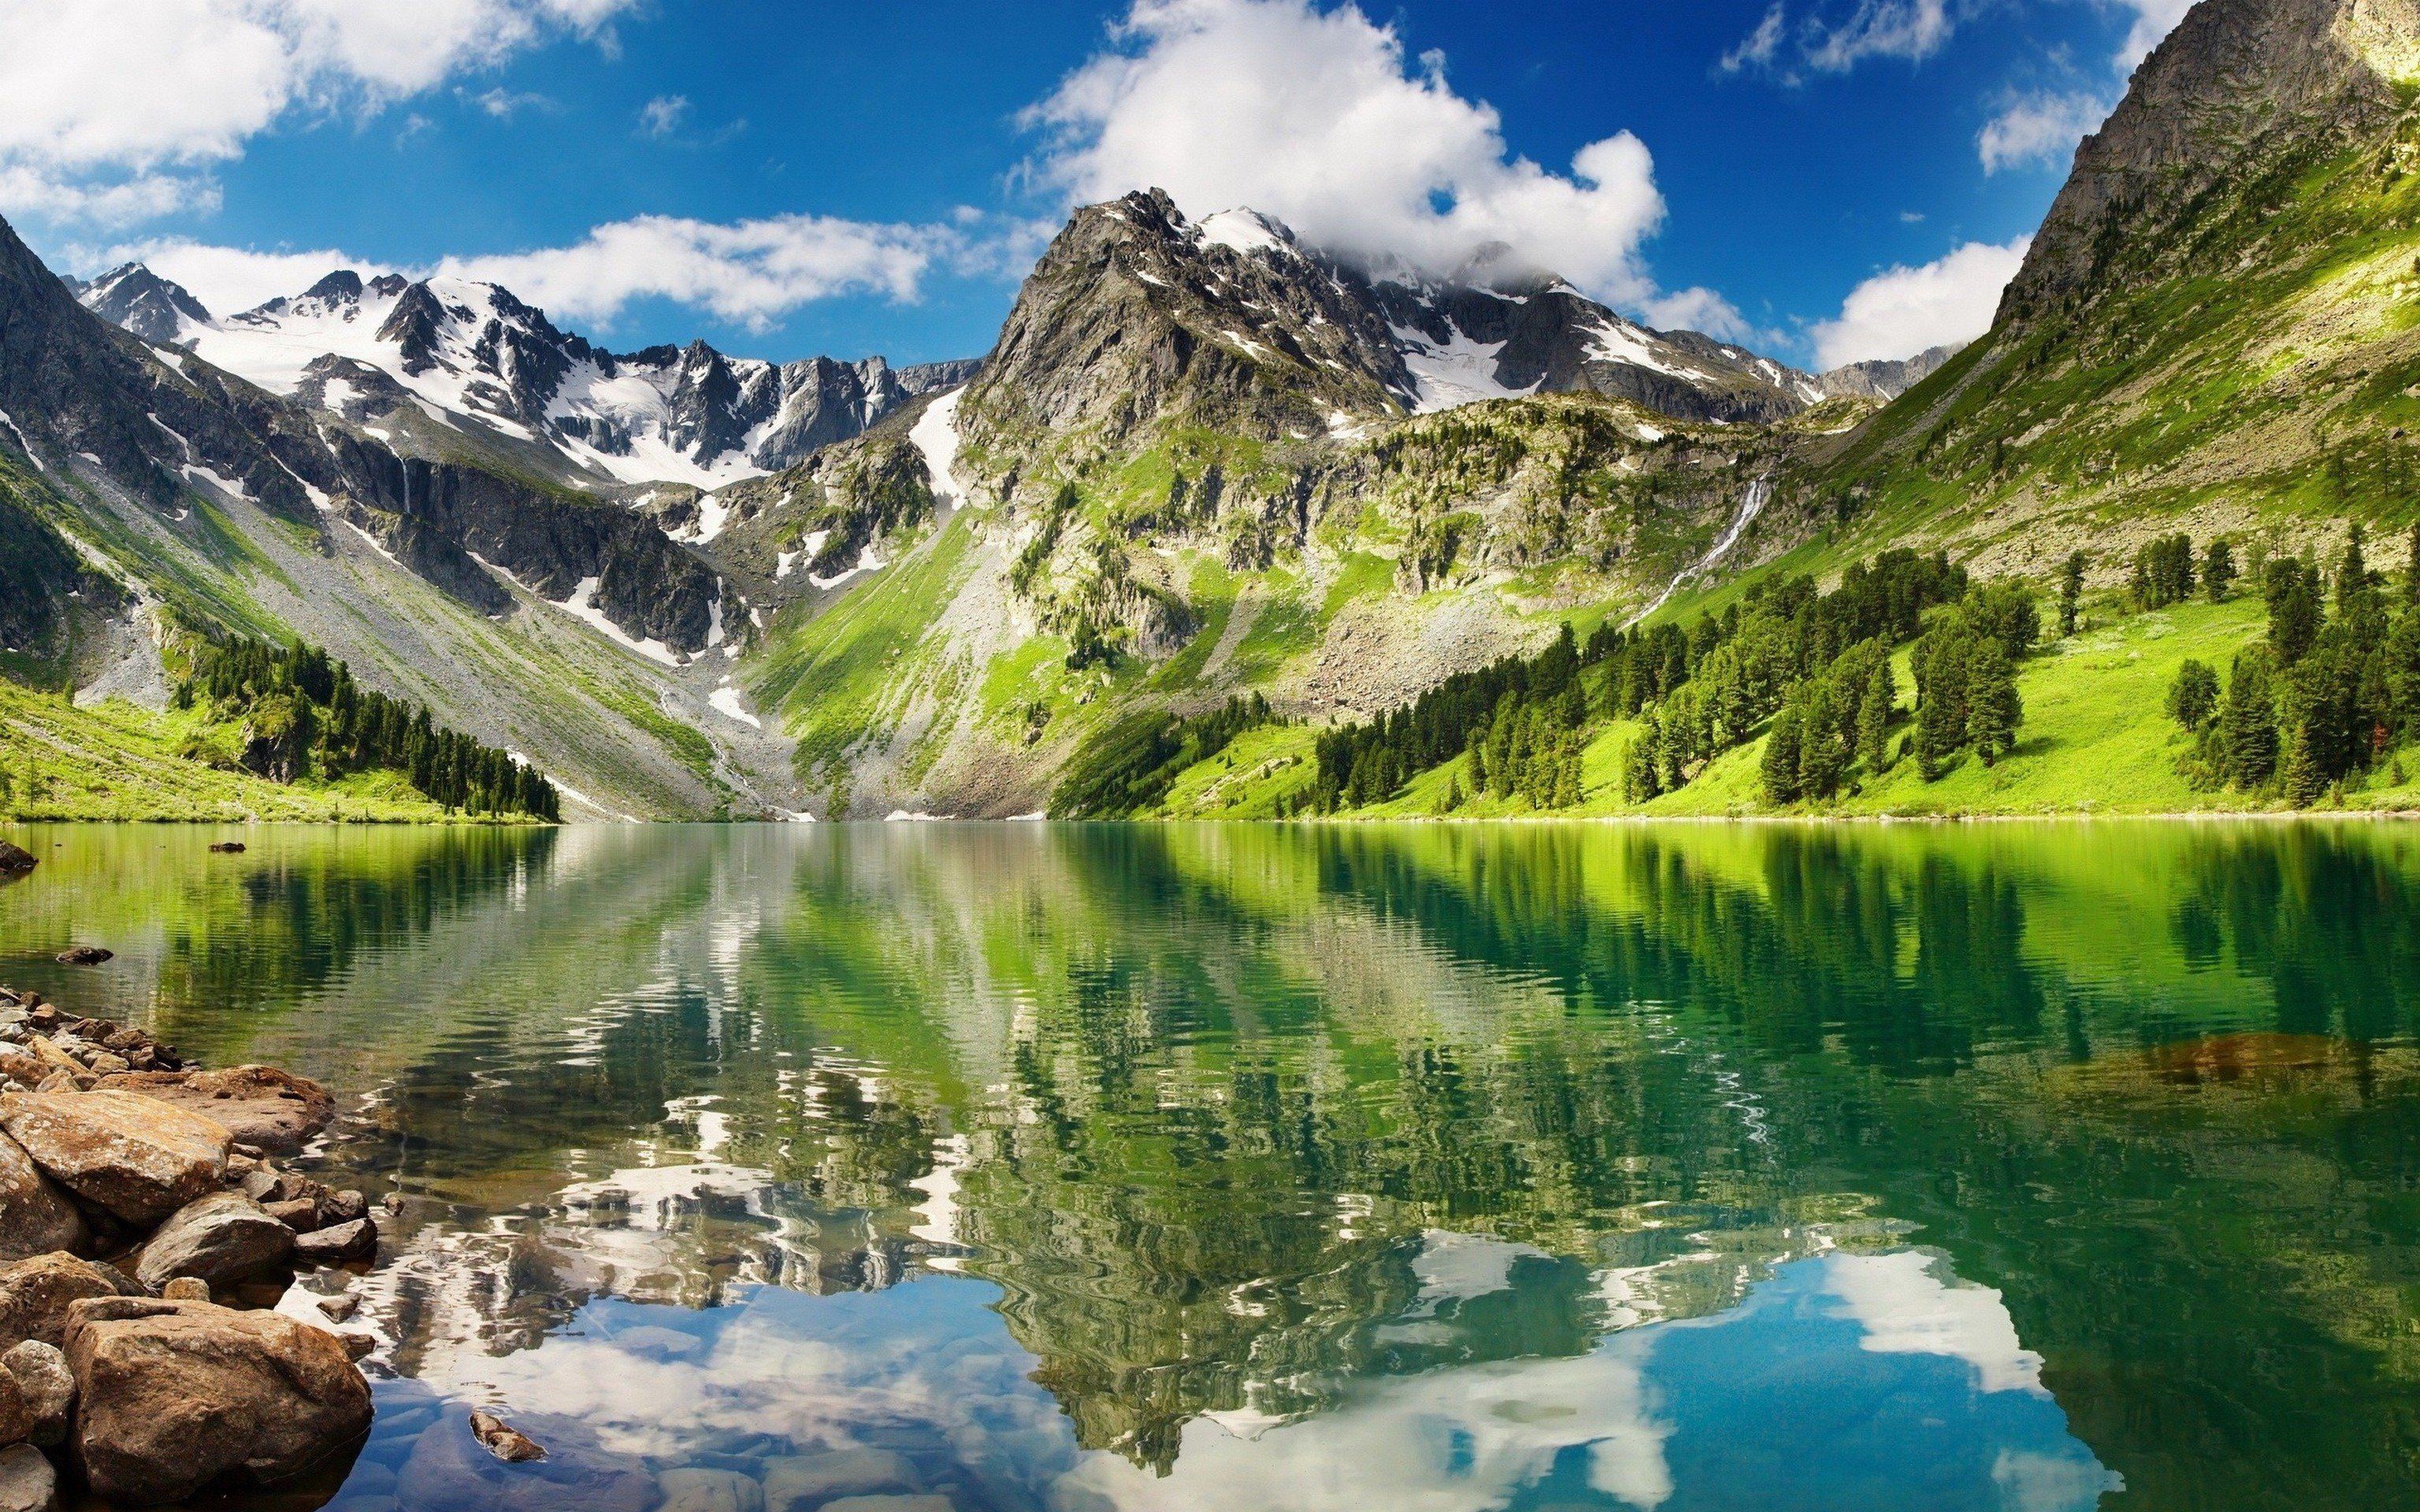 mountains-landscape-nature-mountain-lake-wallpaper-4.jpg (3072×1920)